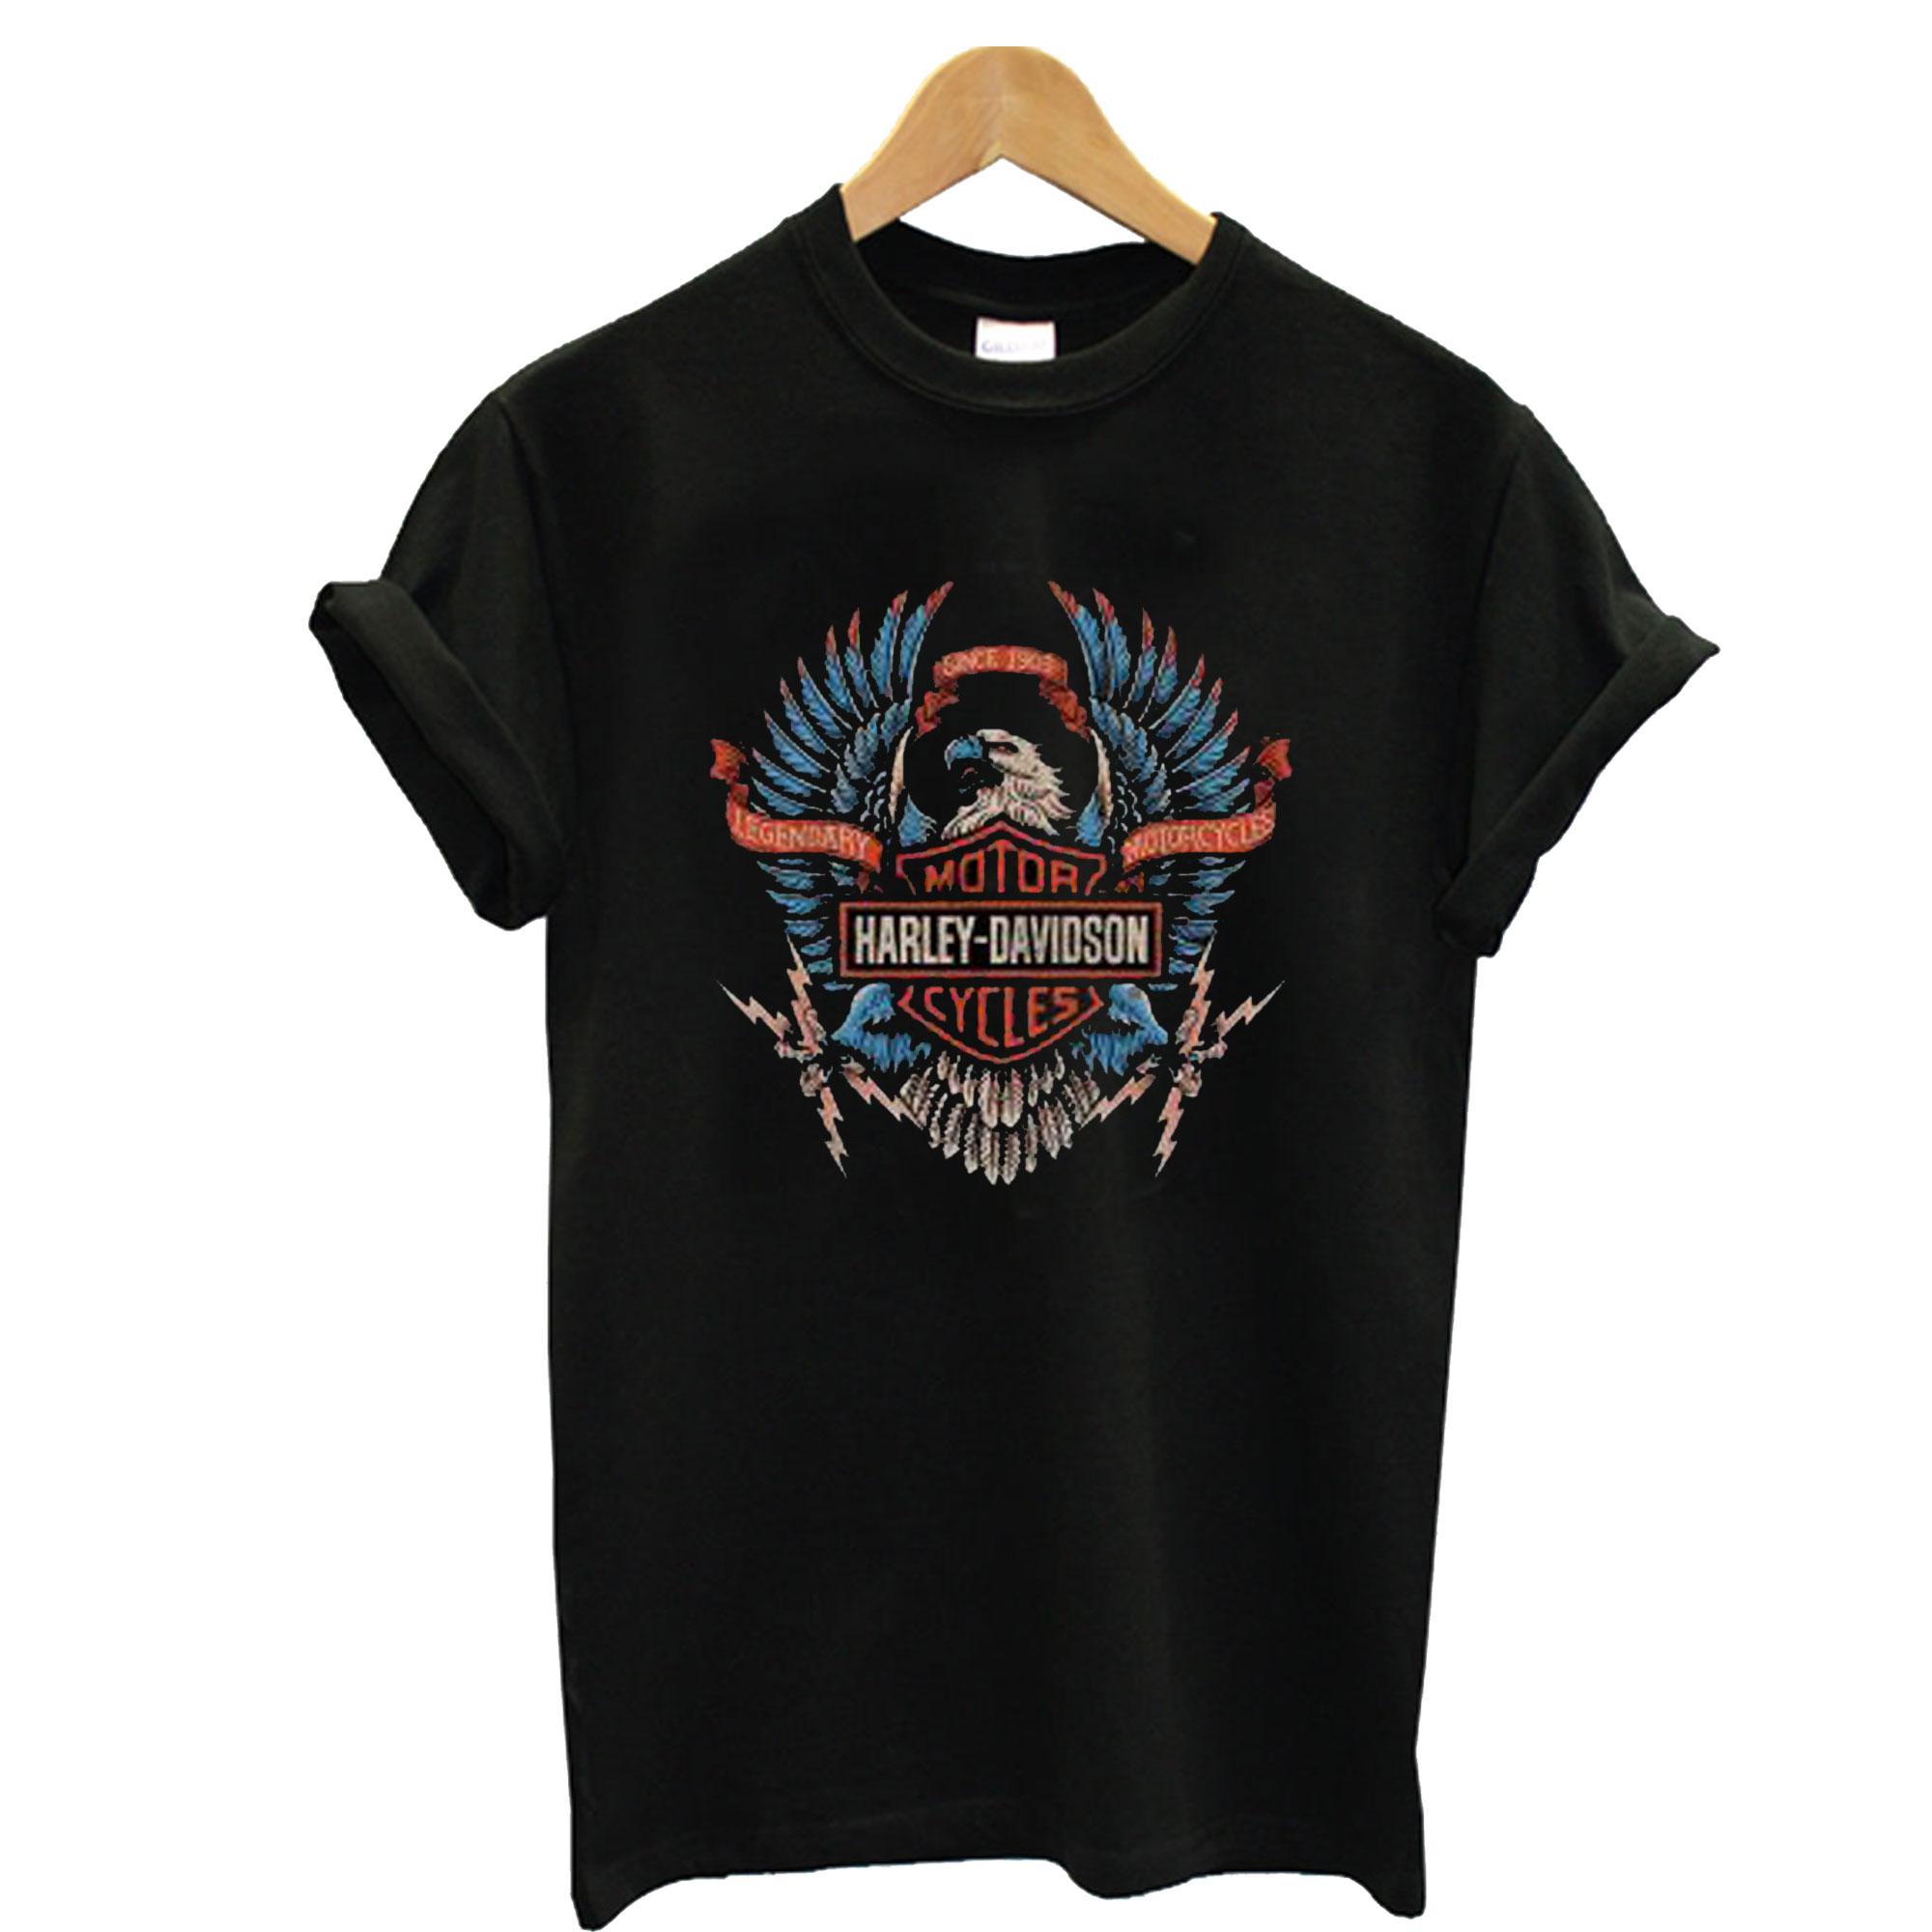 Harley Davidson Legendary Motorcycles T-Shirt